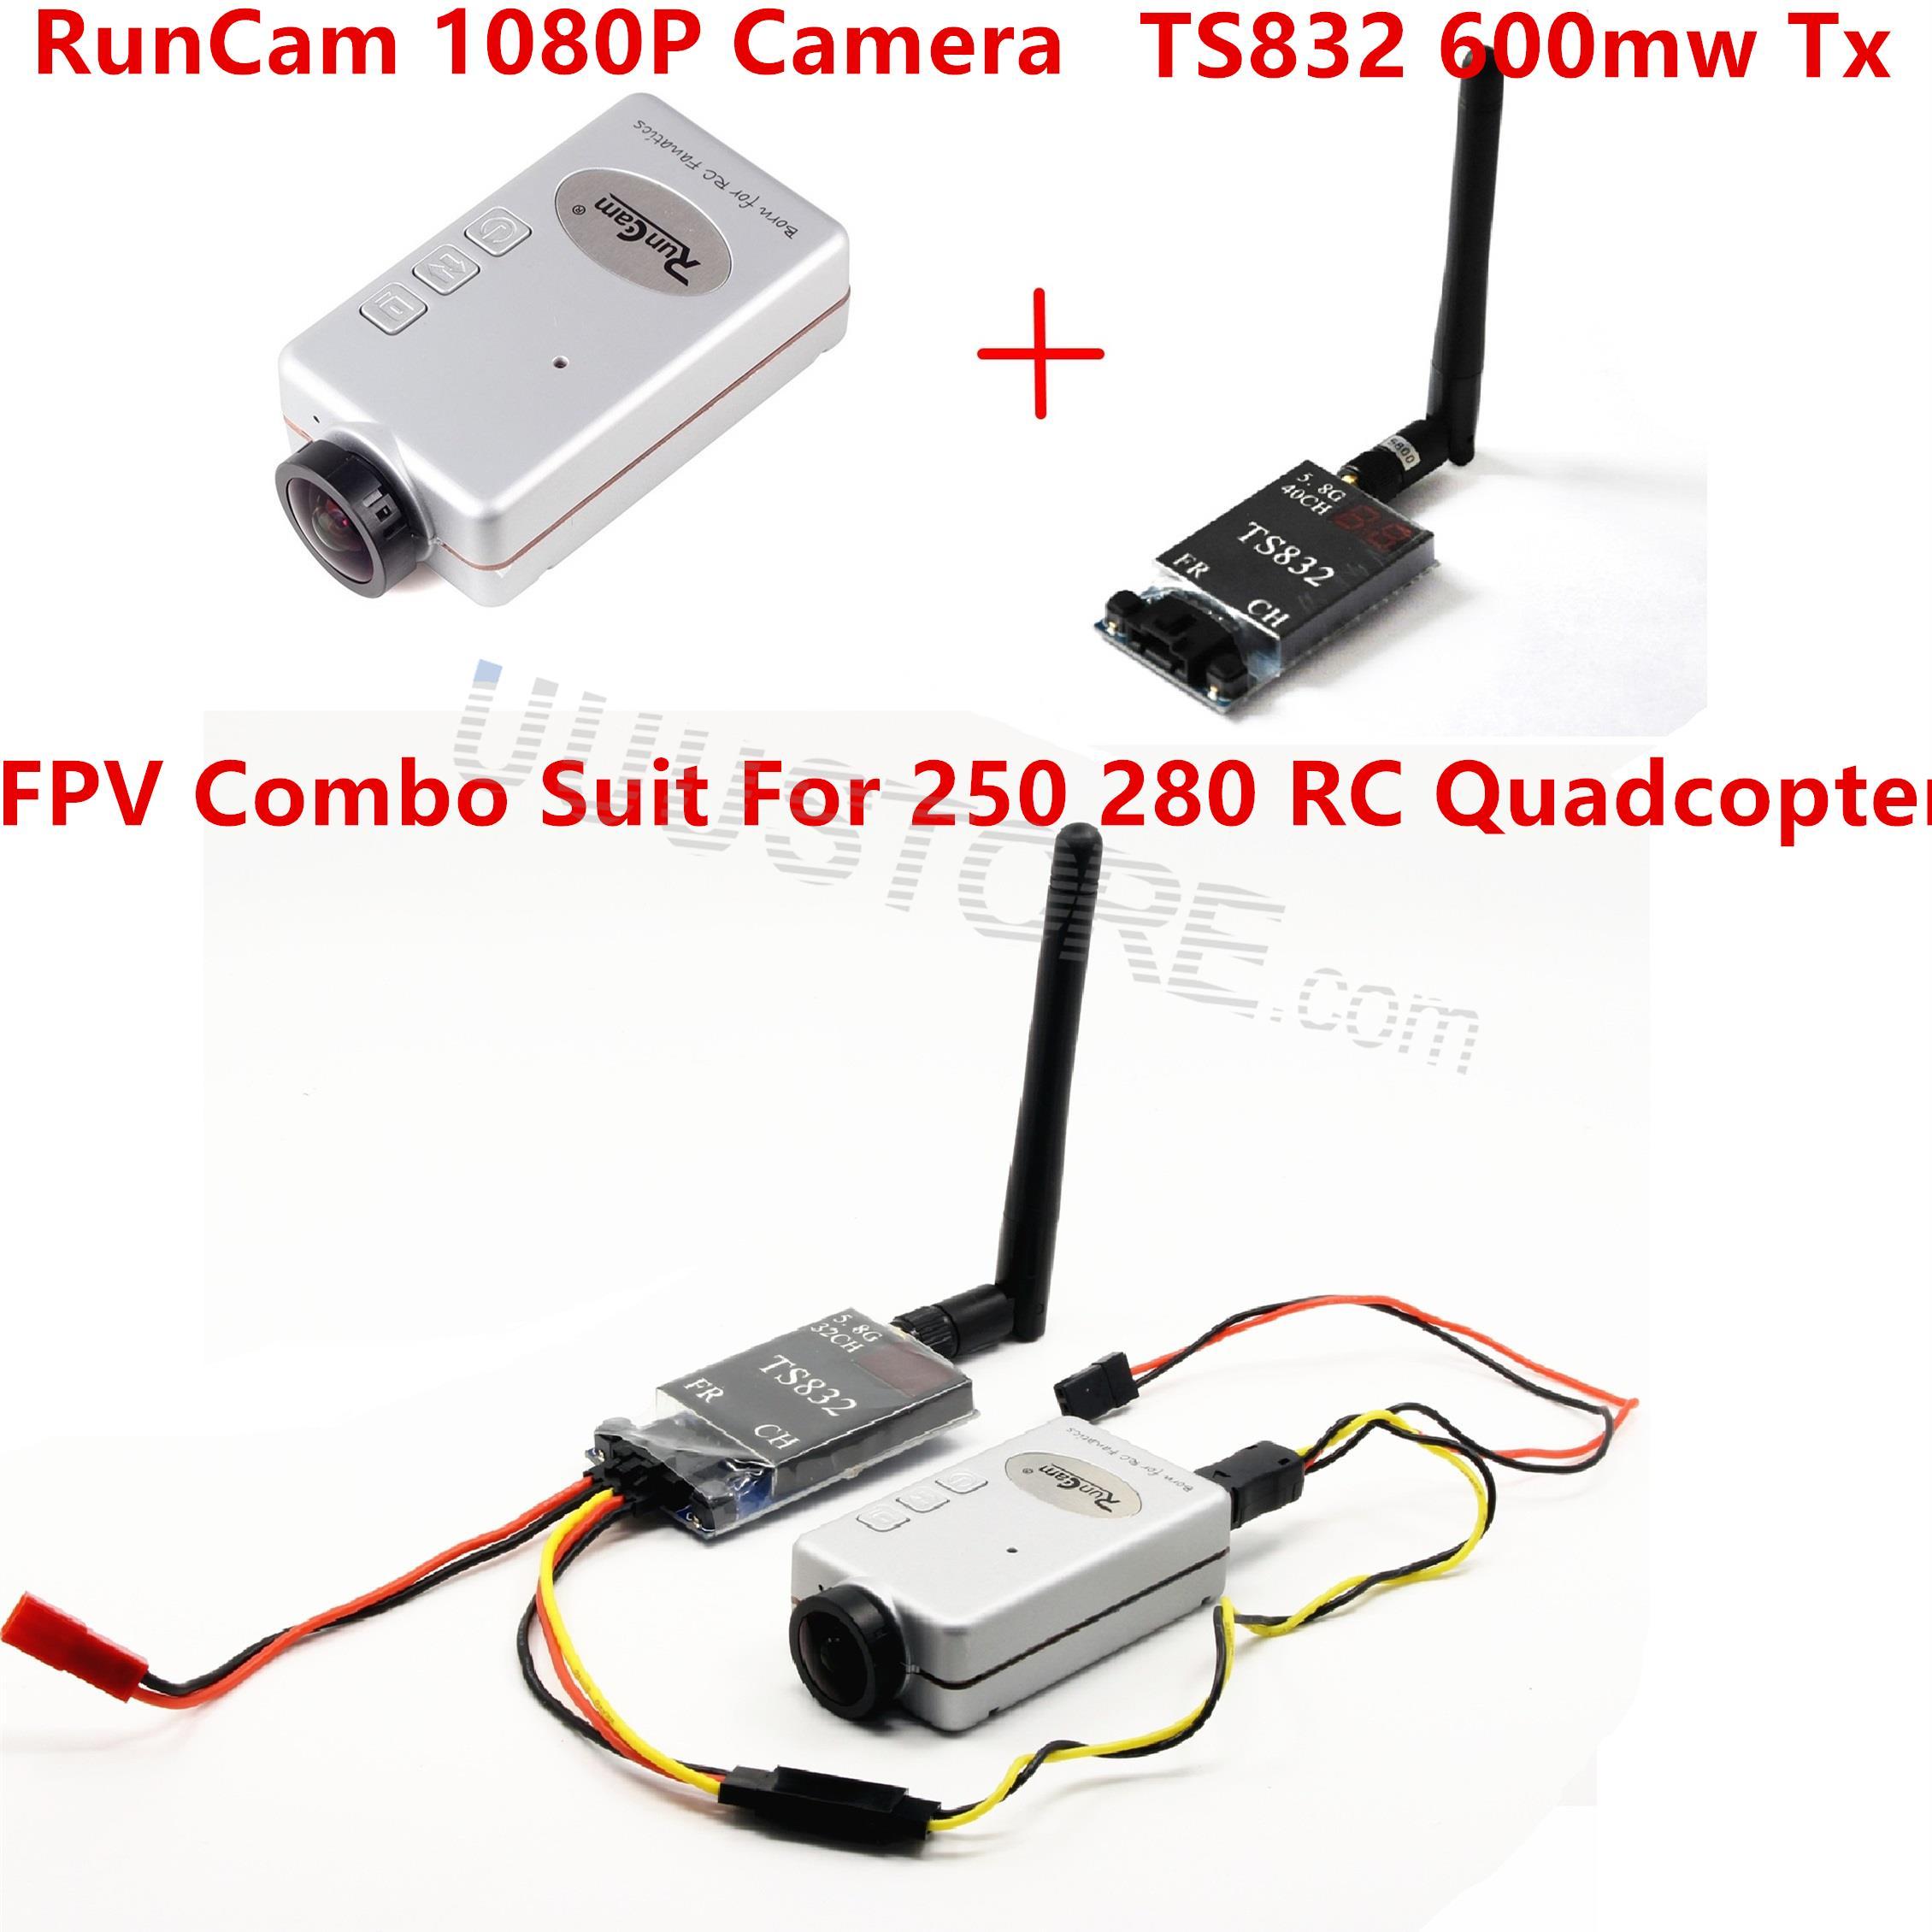 NºMini FPV bo con dvr runcam 1080 p ts832 transmisor de vdeo